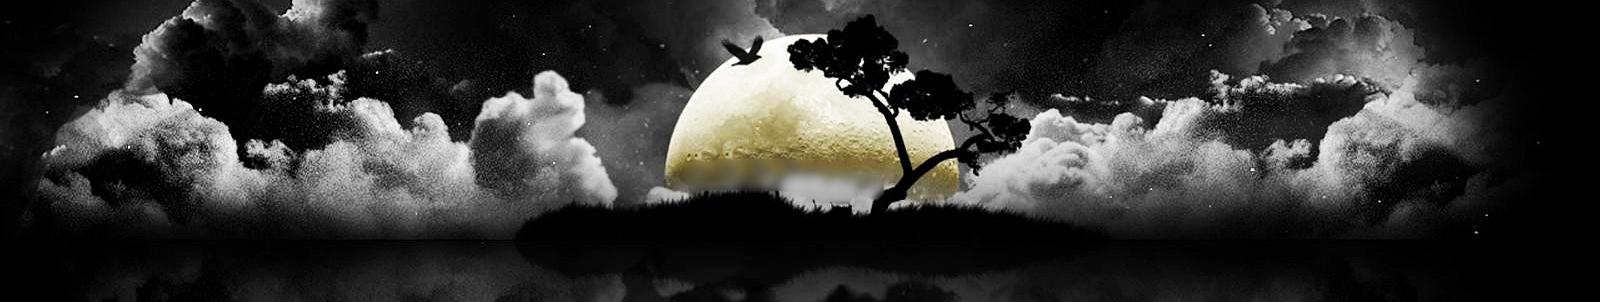 Il mondo Luna Haydn